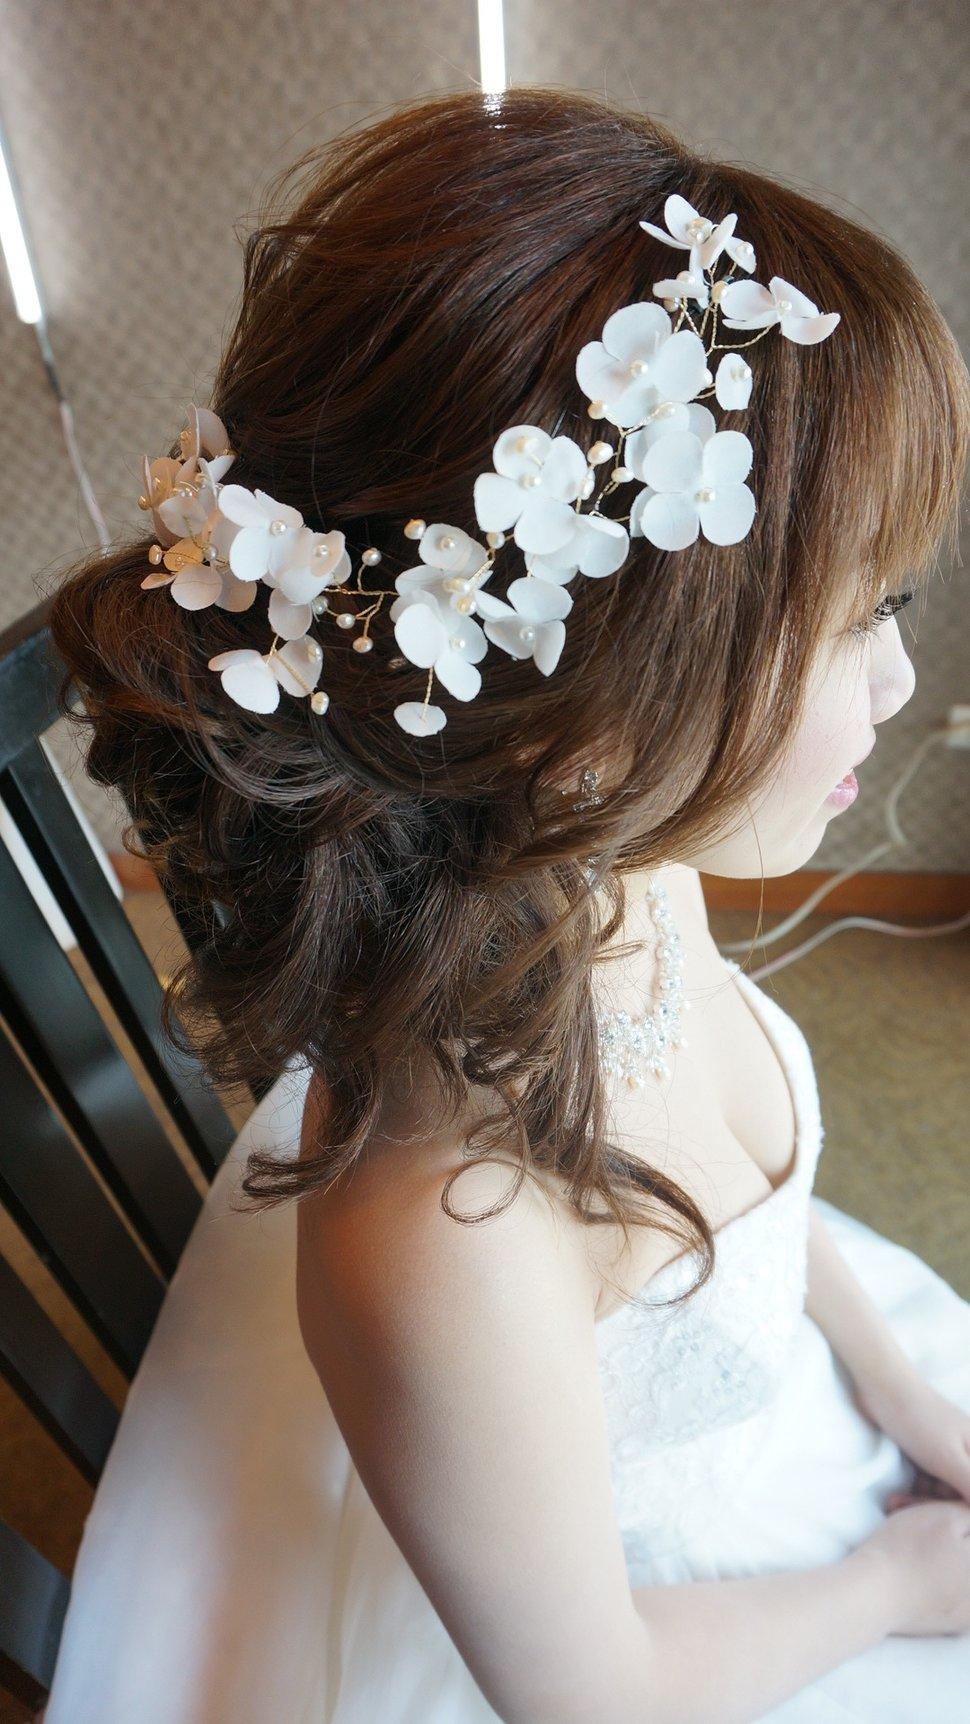 IMG_9869 - Kate忻宜 - 結婚吧